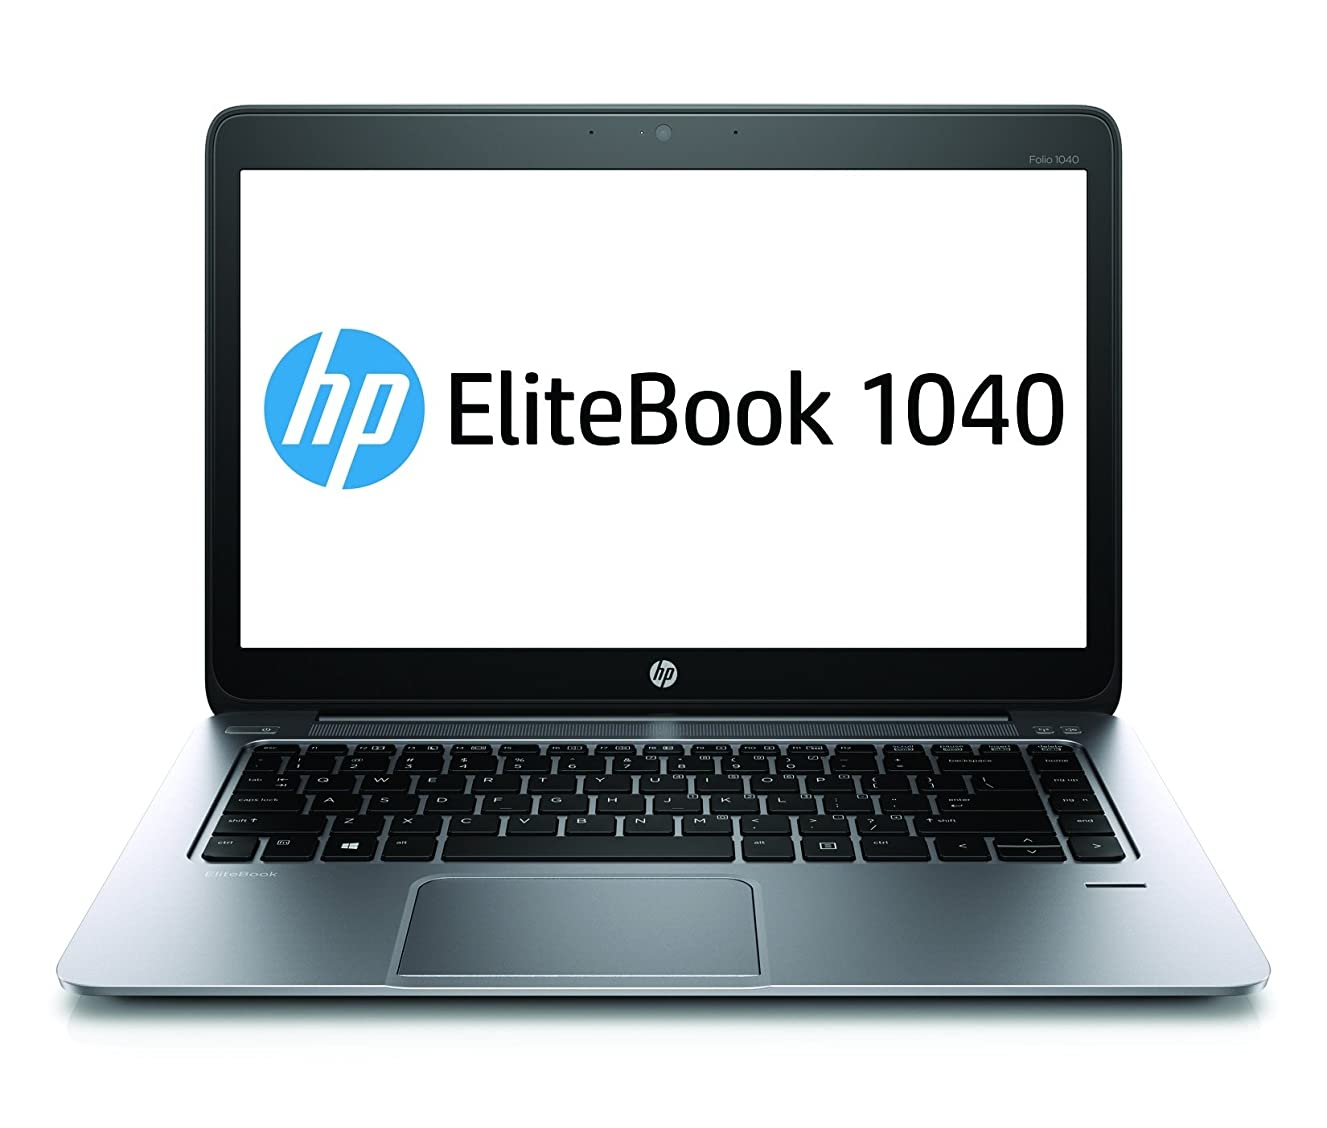 HP EliteBook Folio 1040 G1 14in Laptop Intel Core i5 4300U 1.90 GHz 4G Ram 128G SSD Windows 10 Pro (Renewed)